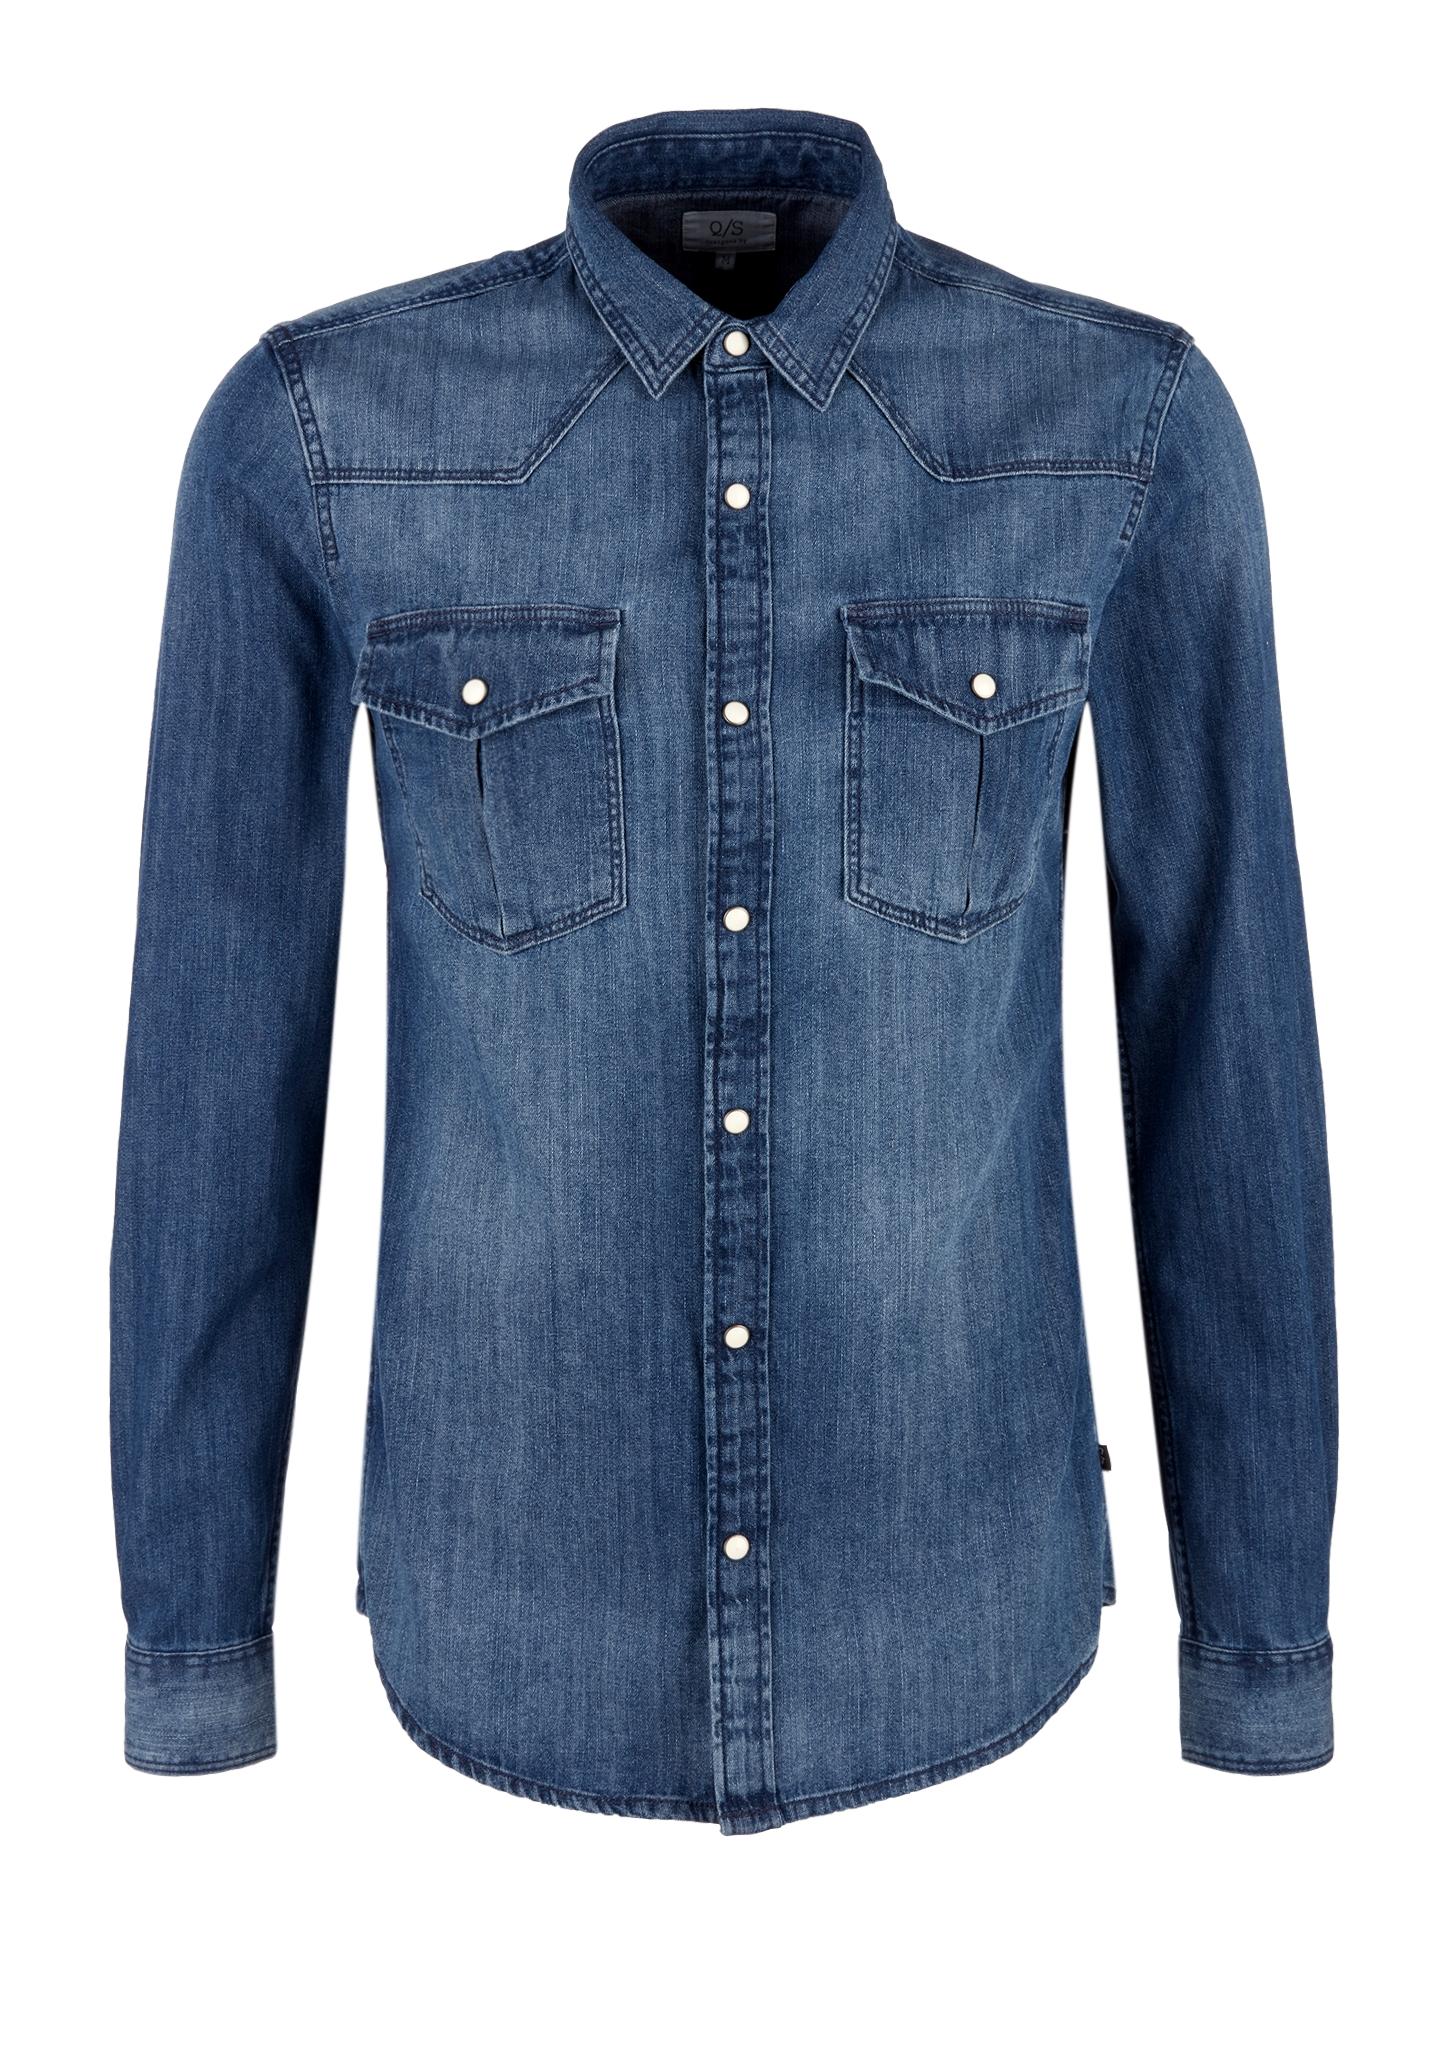 Jeanshemd | Bekleidung > Hemden > Jeanshemden | Blau | 100% baumwolle | Q/S designed by